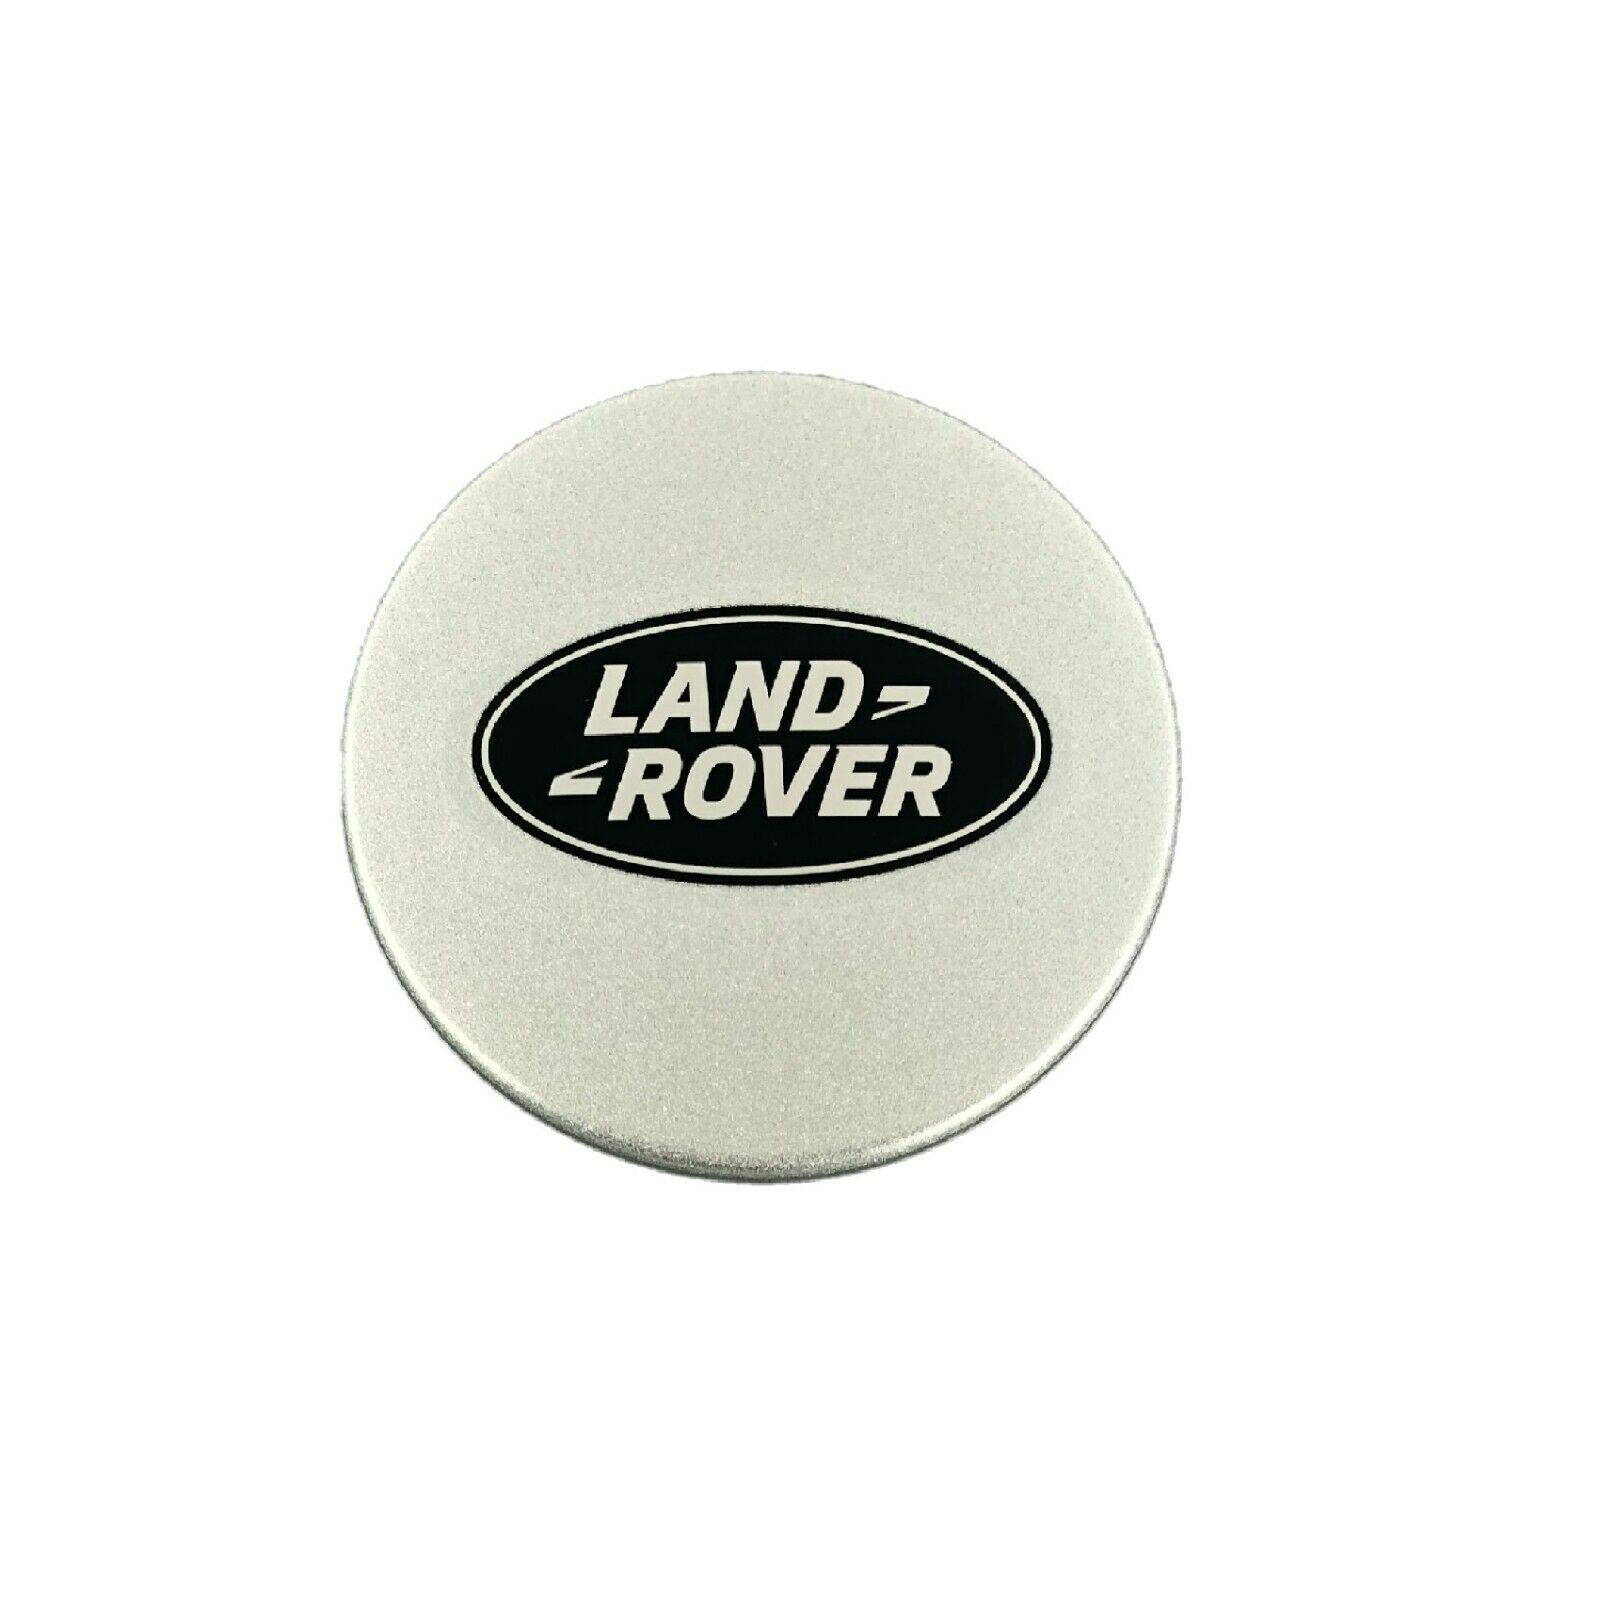 Land Range Rover Supercharged Black Oval Badge Wheel Center Hub Cap  New